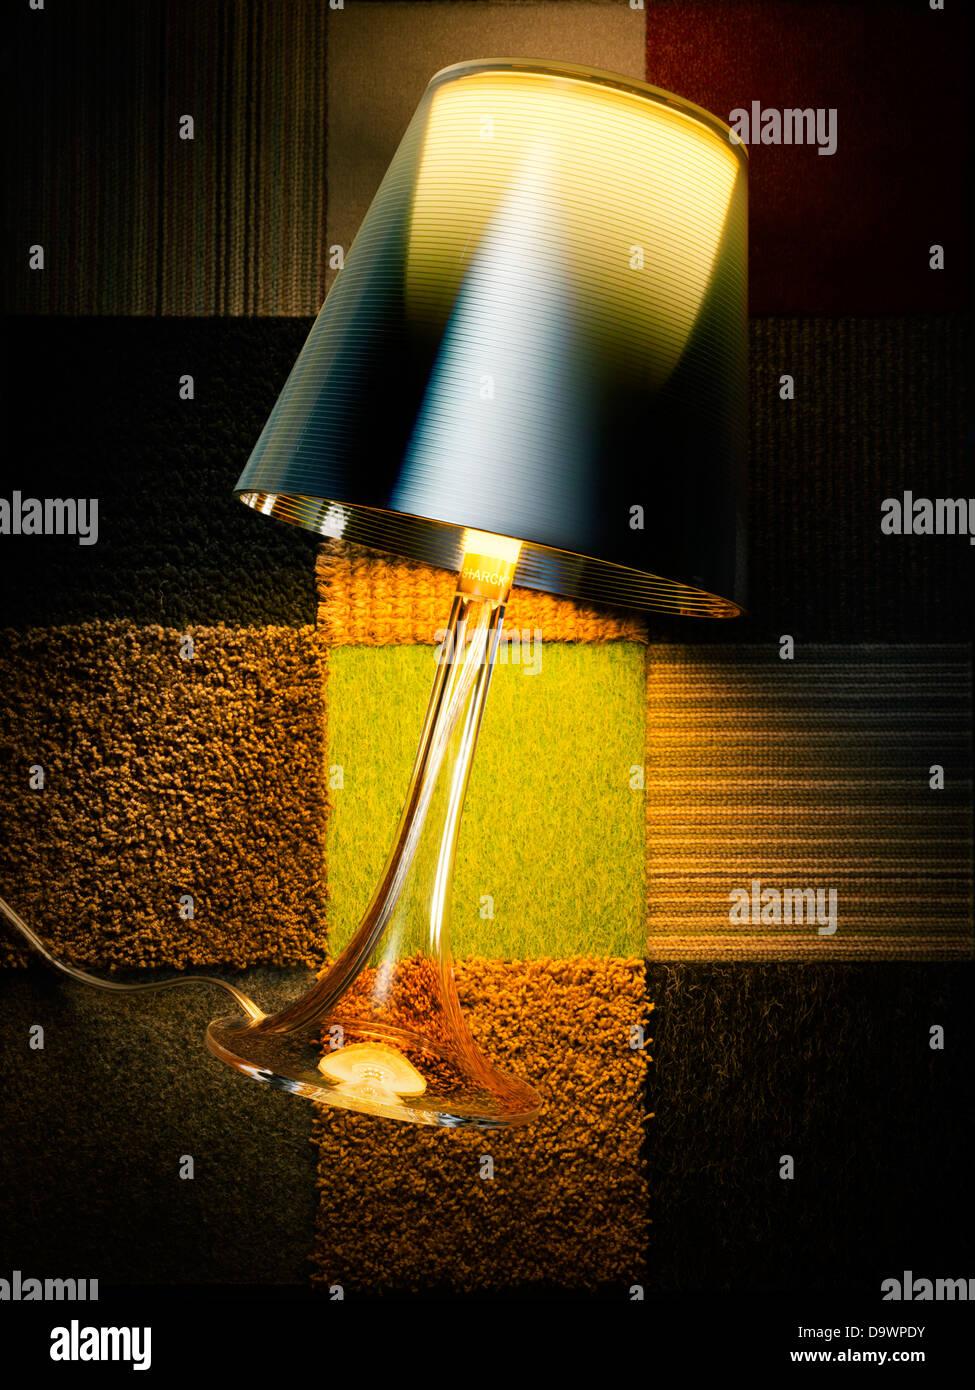 lámpara sobre una alfombra Imagen De Stock